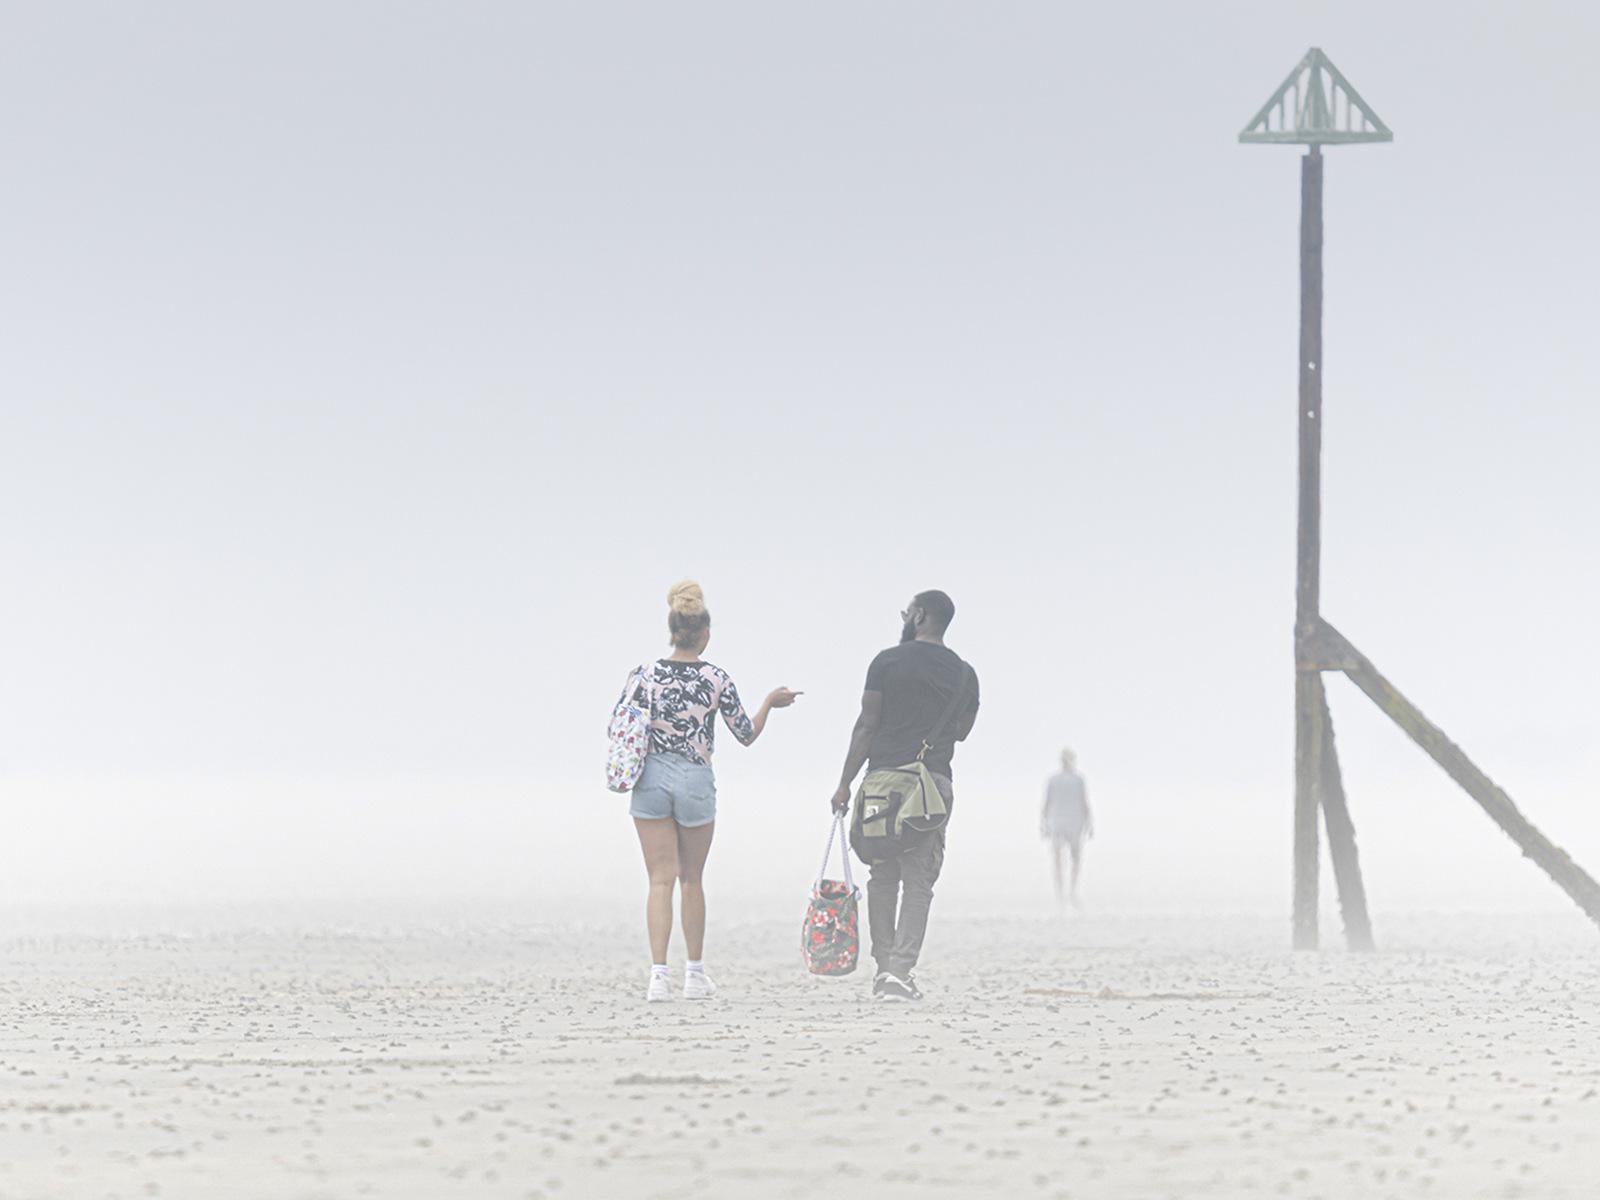 Paul-Adams-Friends-Oblivious-of-Sudden-Sea-Fog-10